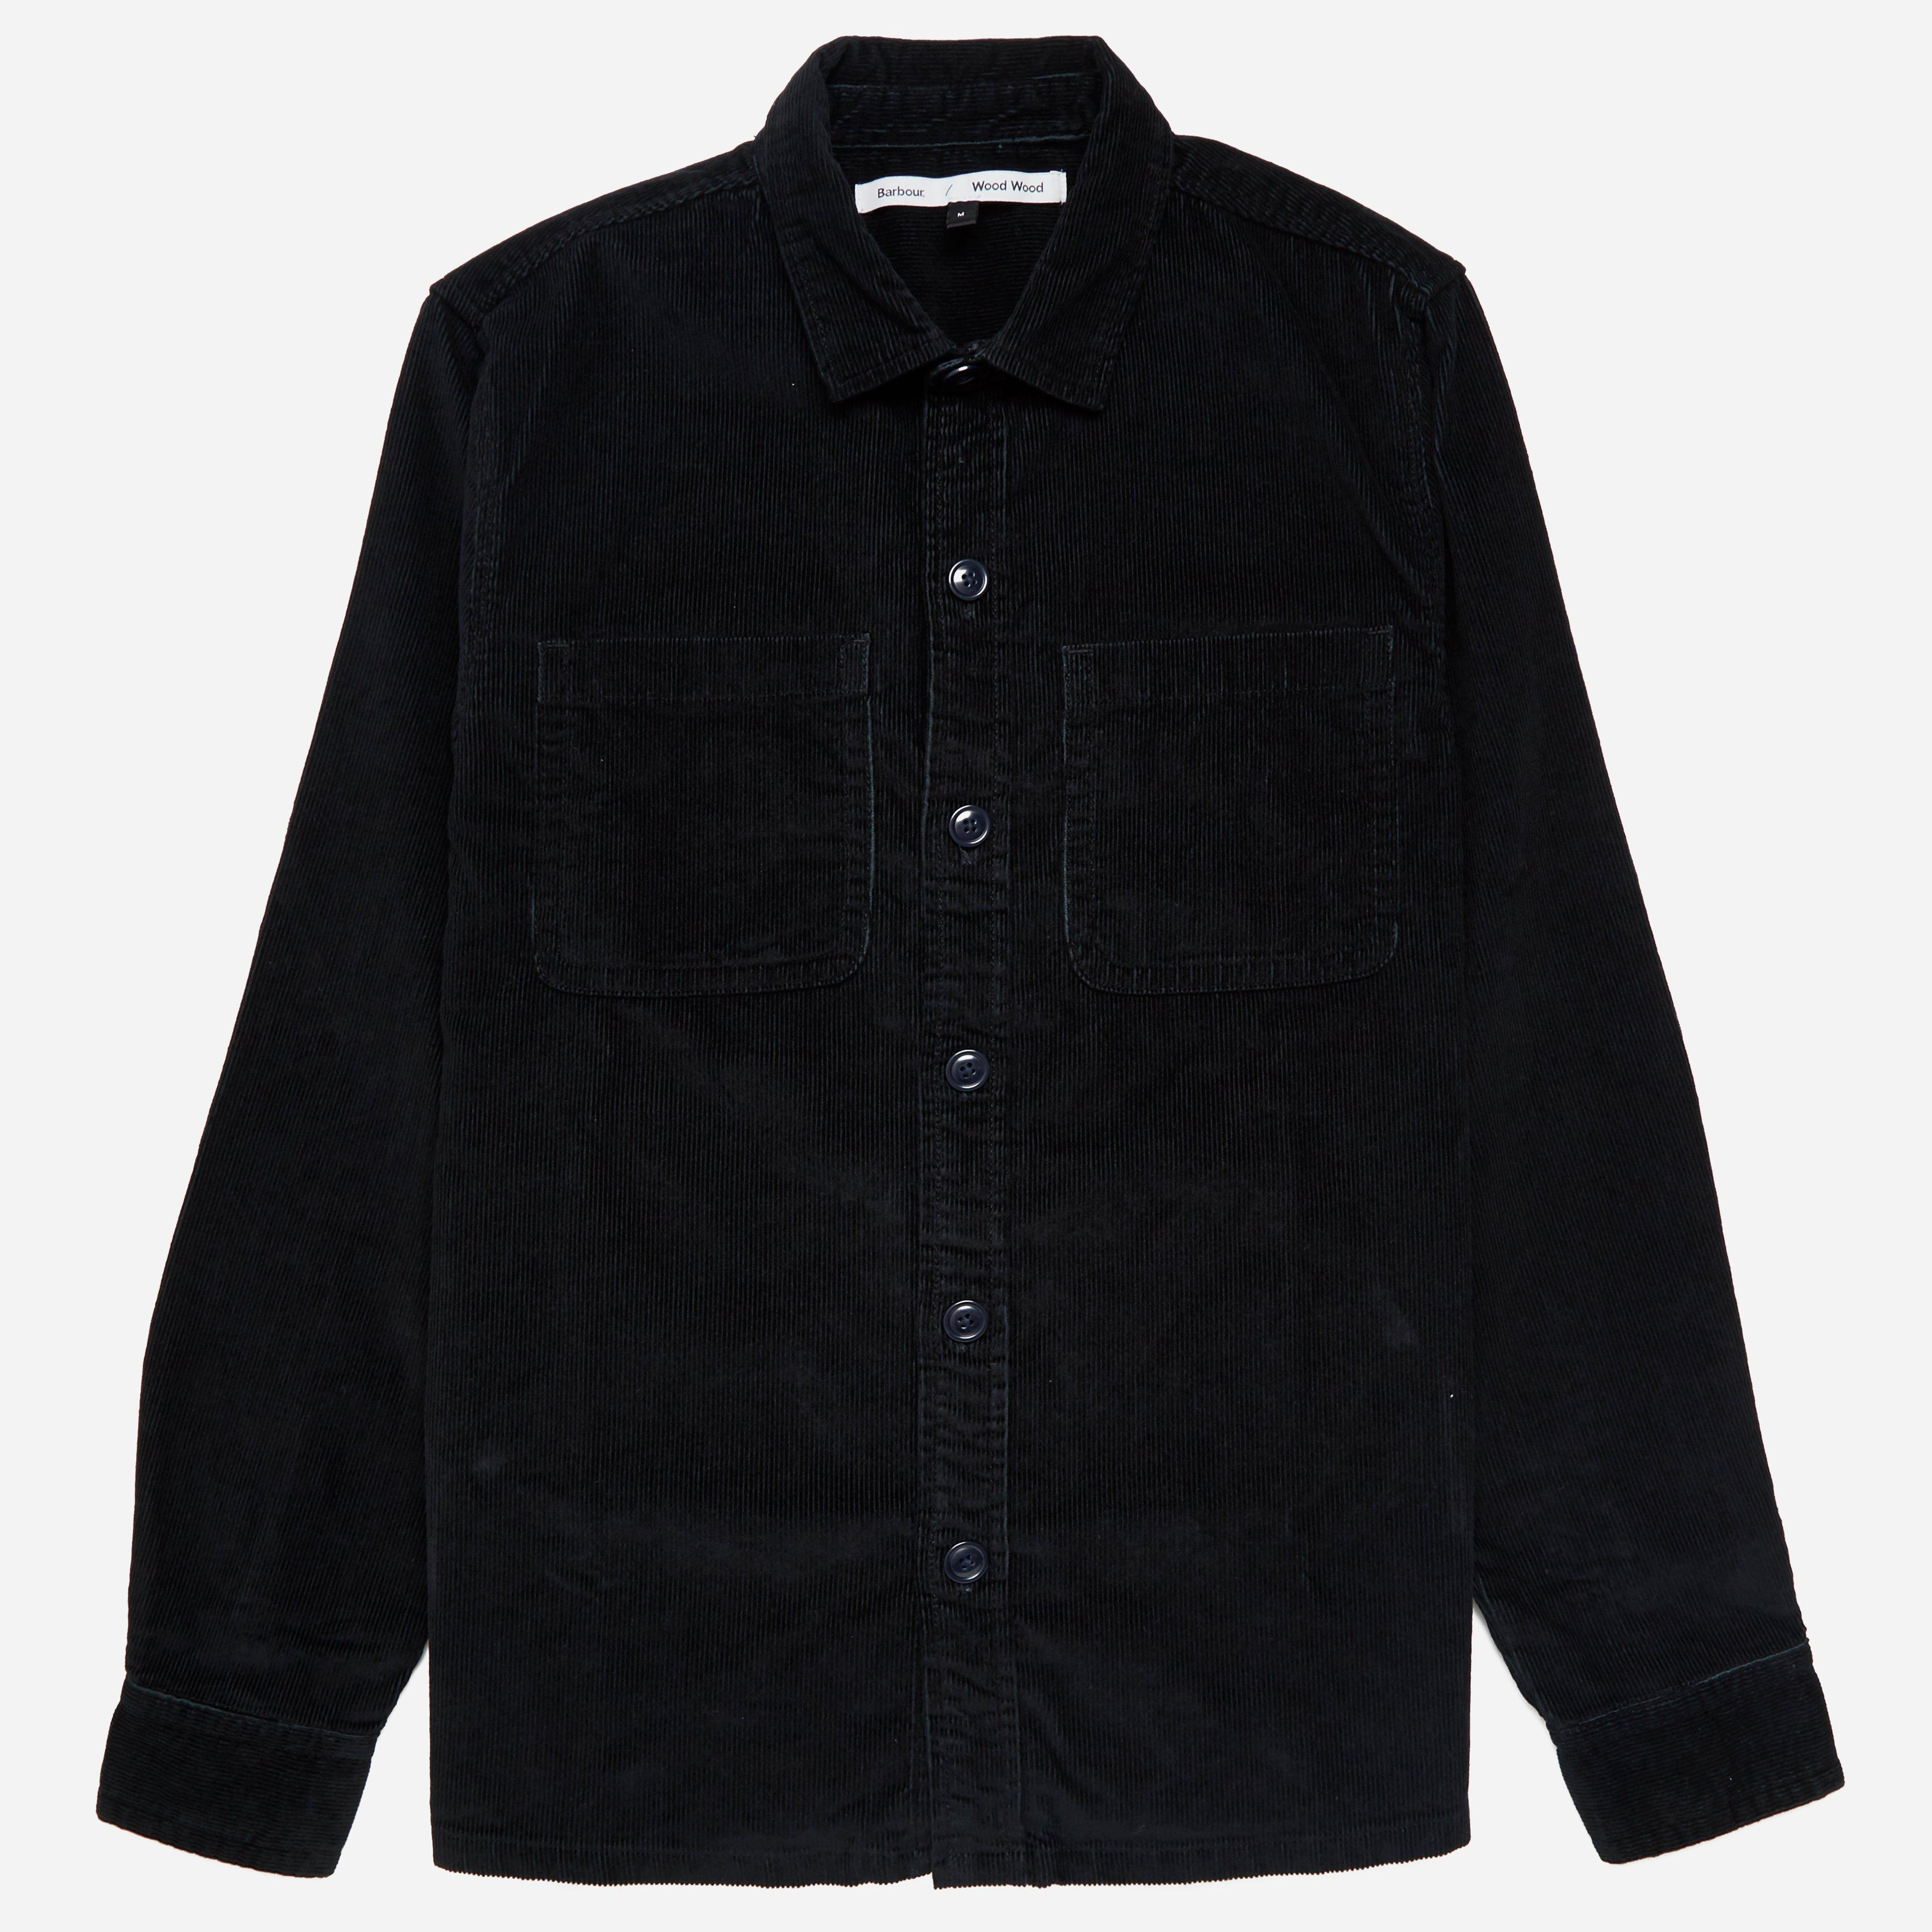 Barbour X Wood Wood Fidra Cord Overshirt